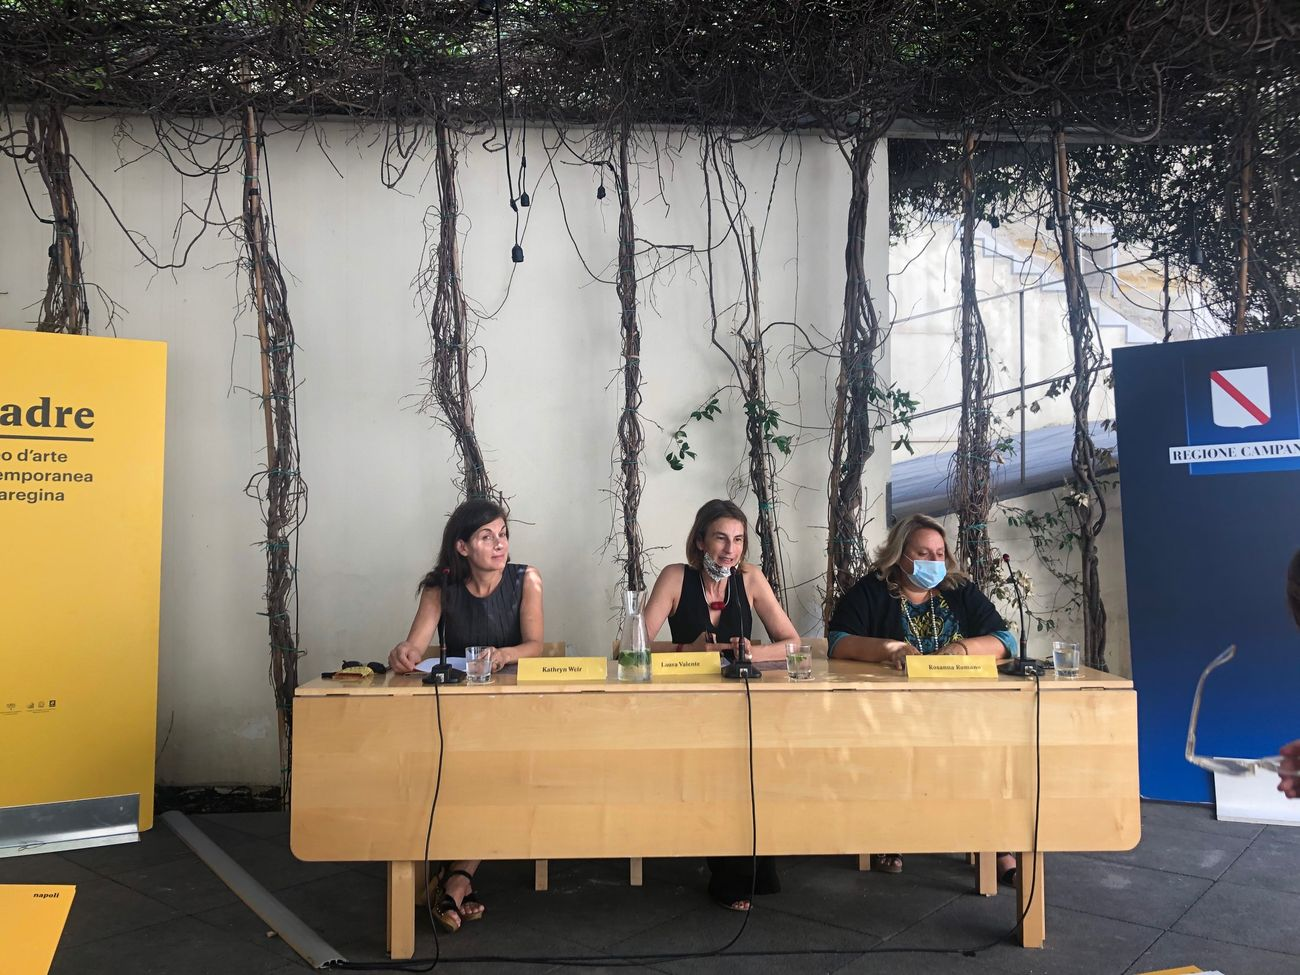 Kathryn Weir, Laura Valente e Rosanna Romano